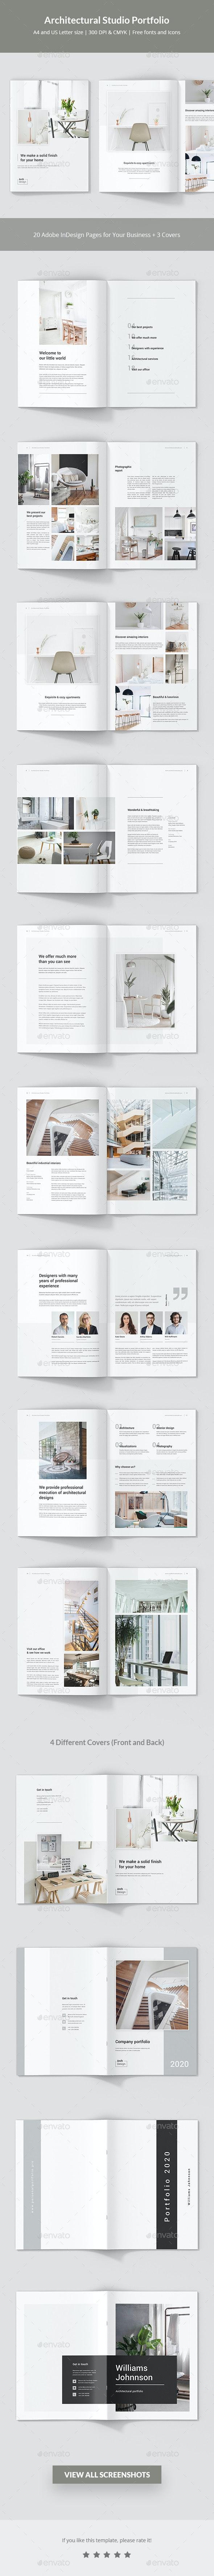 Architectural Studio Portfolio - Portfolio Brochures